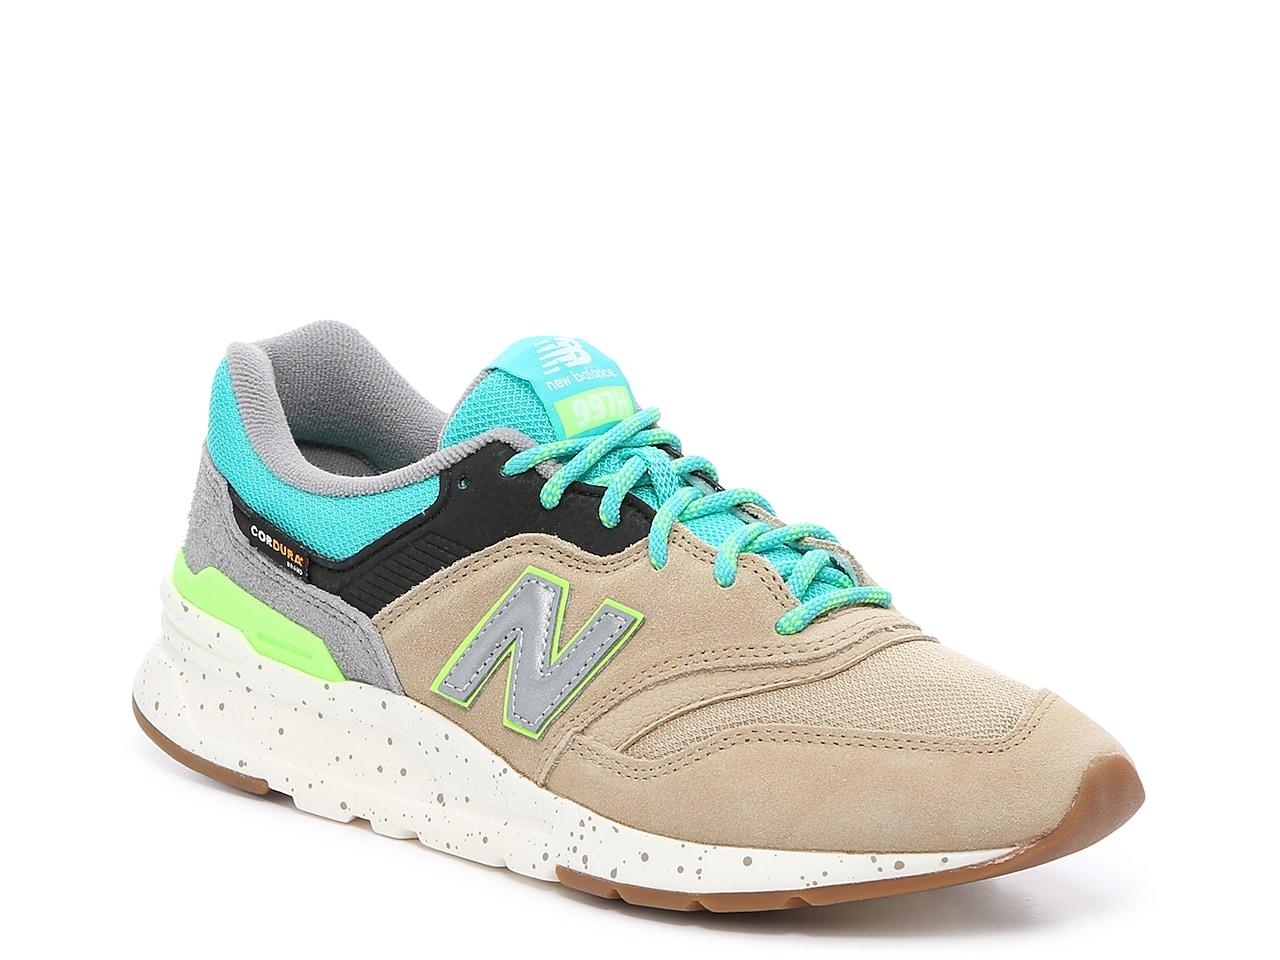 997H Sneaker - Men's